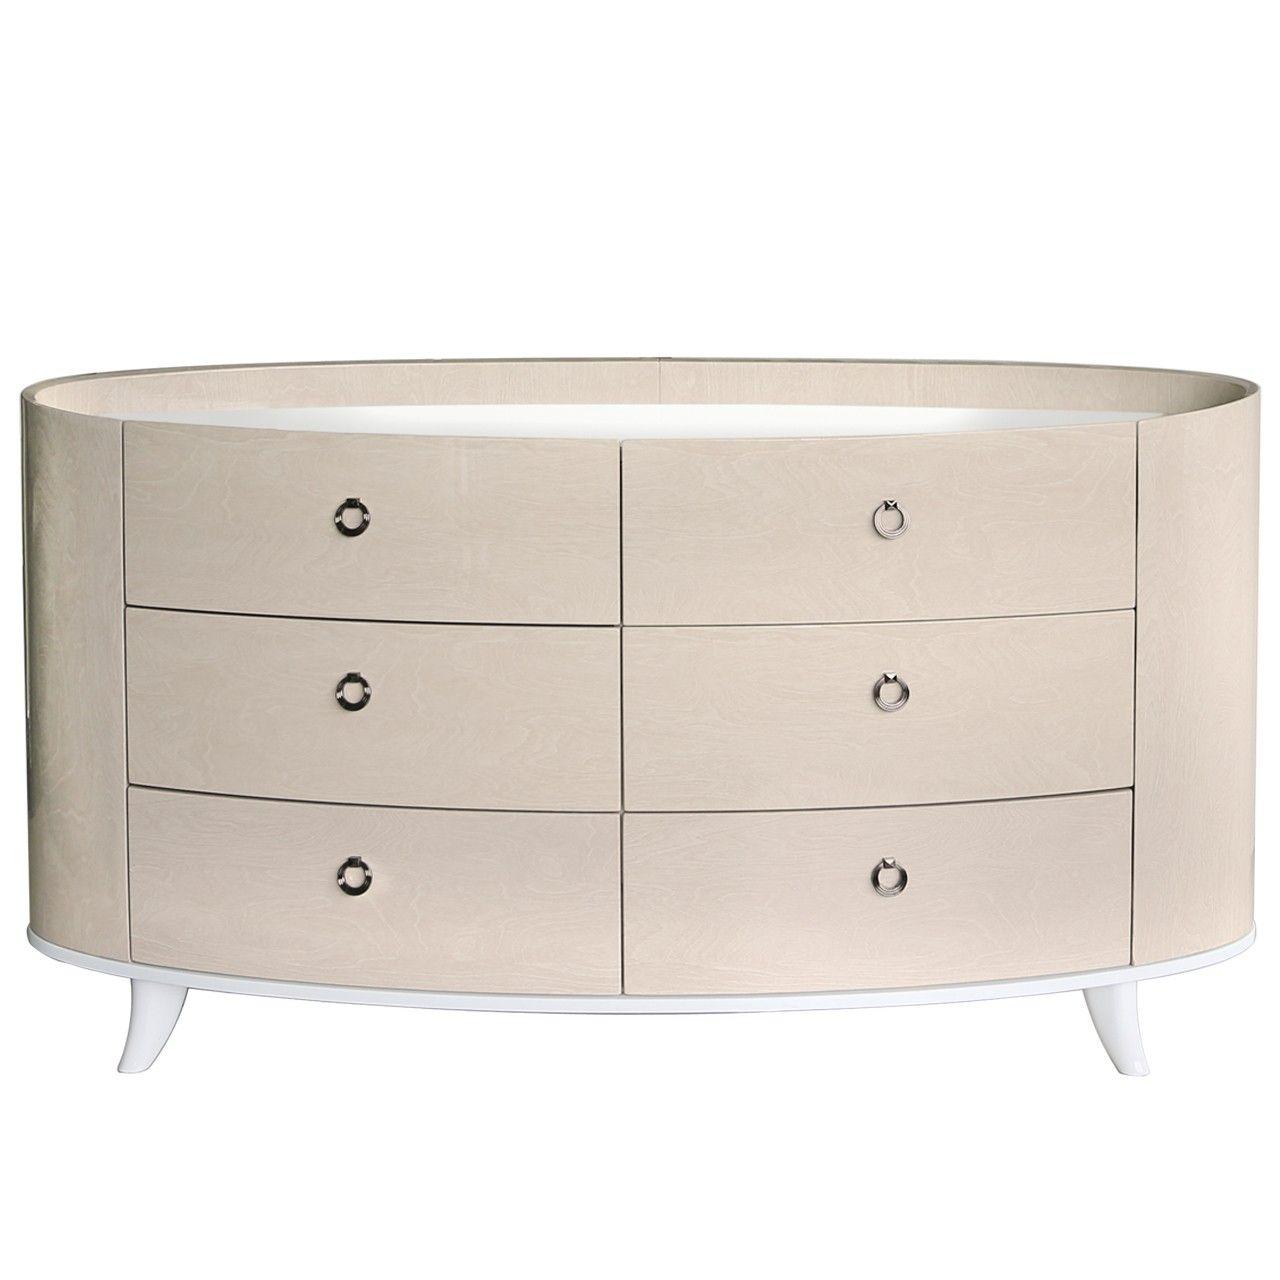 Enzo Light Ivory Walnut 6 Drawer Cabinet